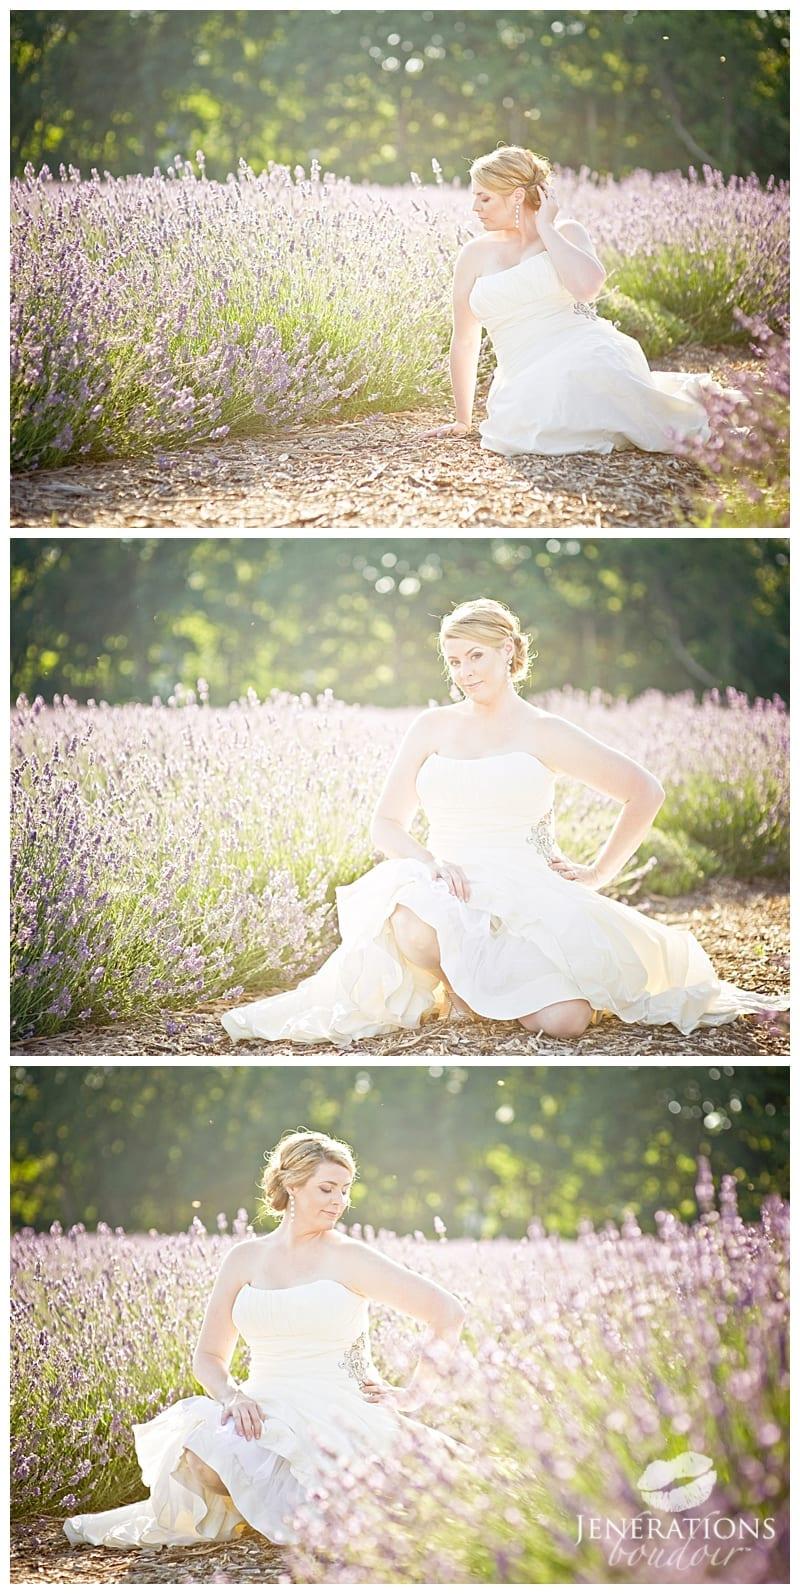 NY Boudoir Photography | Love the Dress Part 2